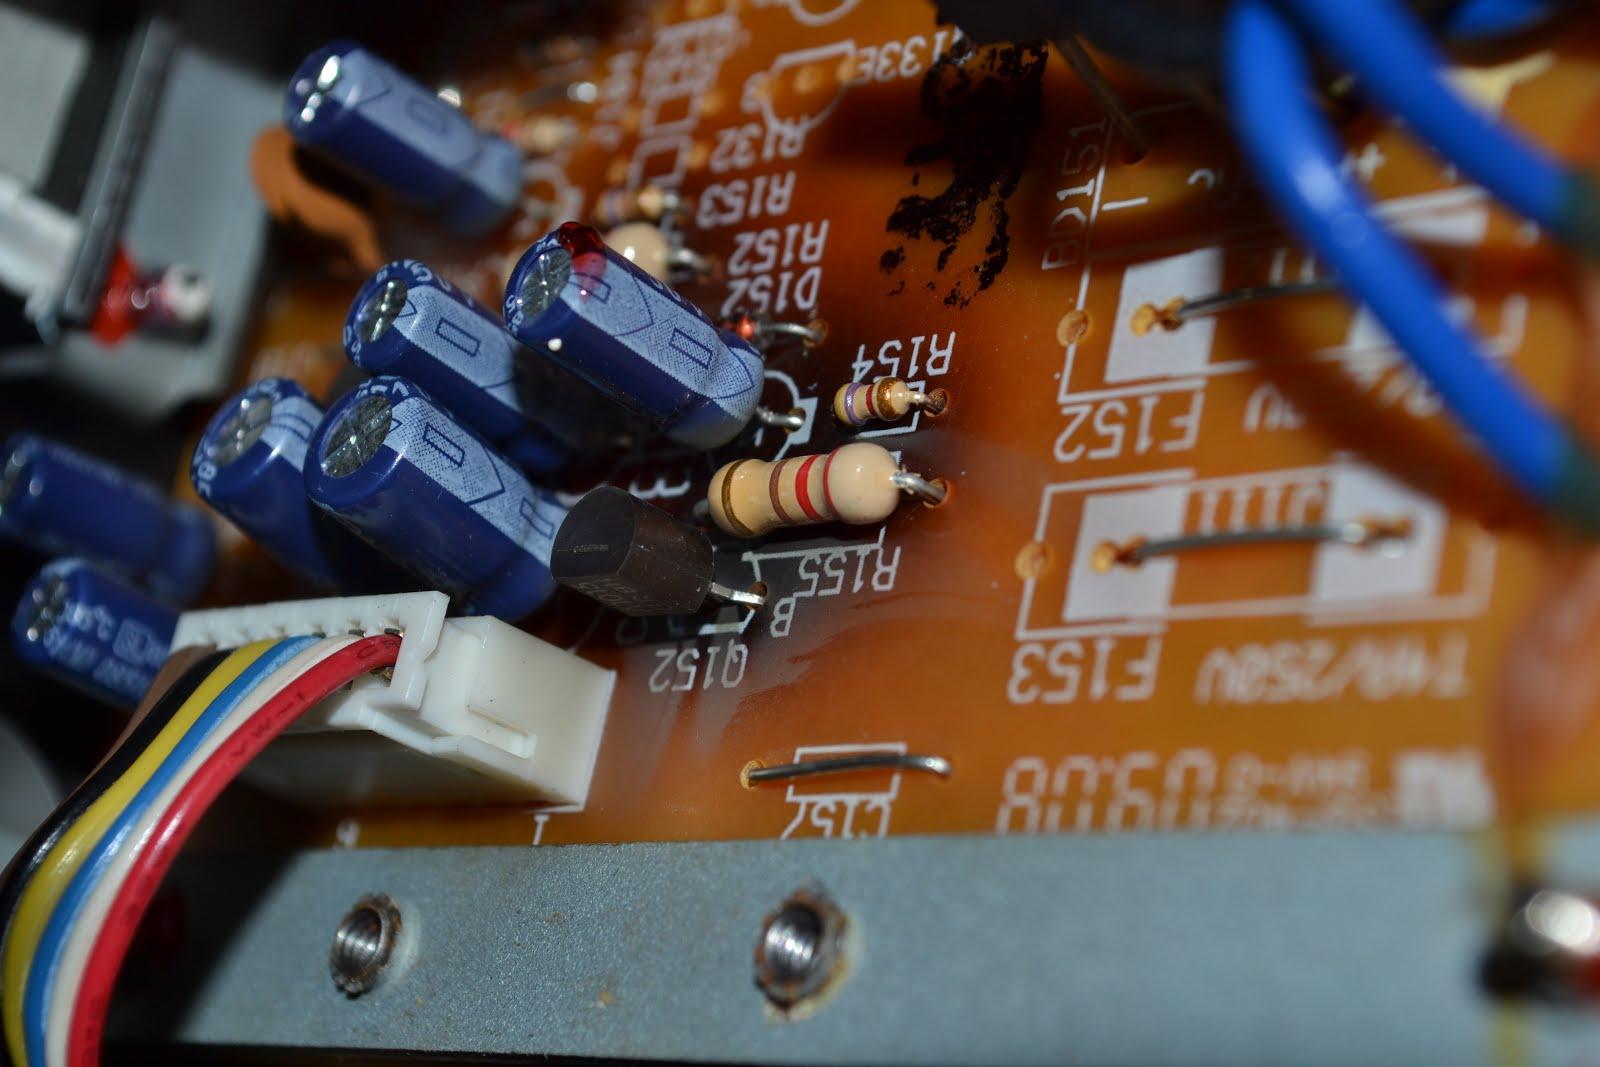 Doz' Blog: Tannoy SFX5 1 Powered subwoofer repair